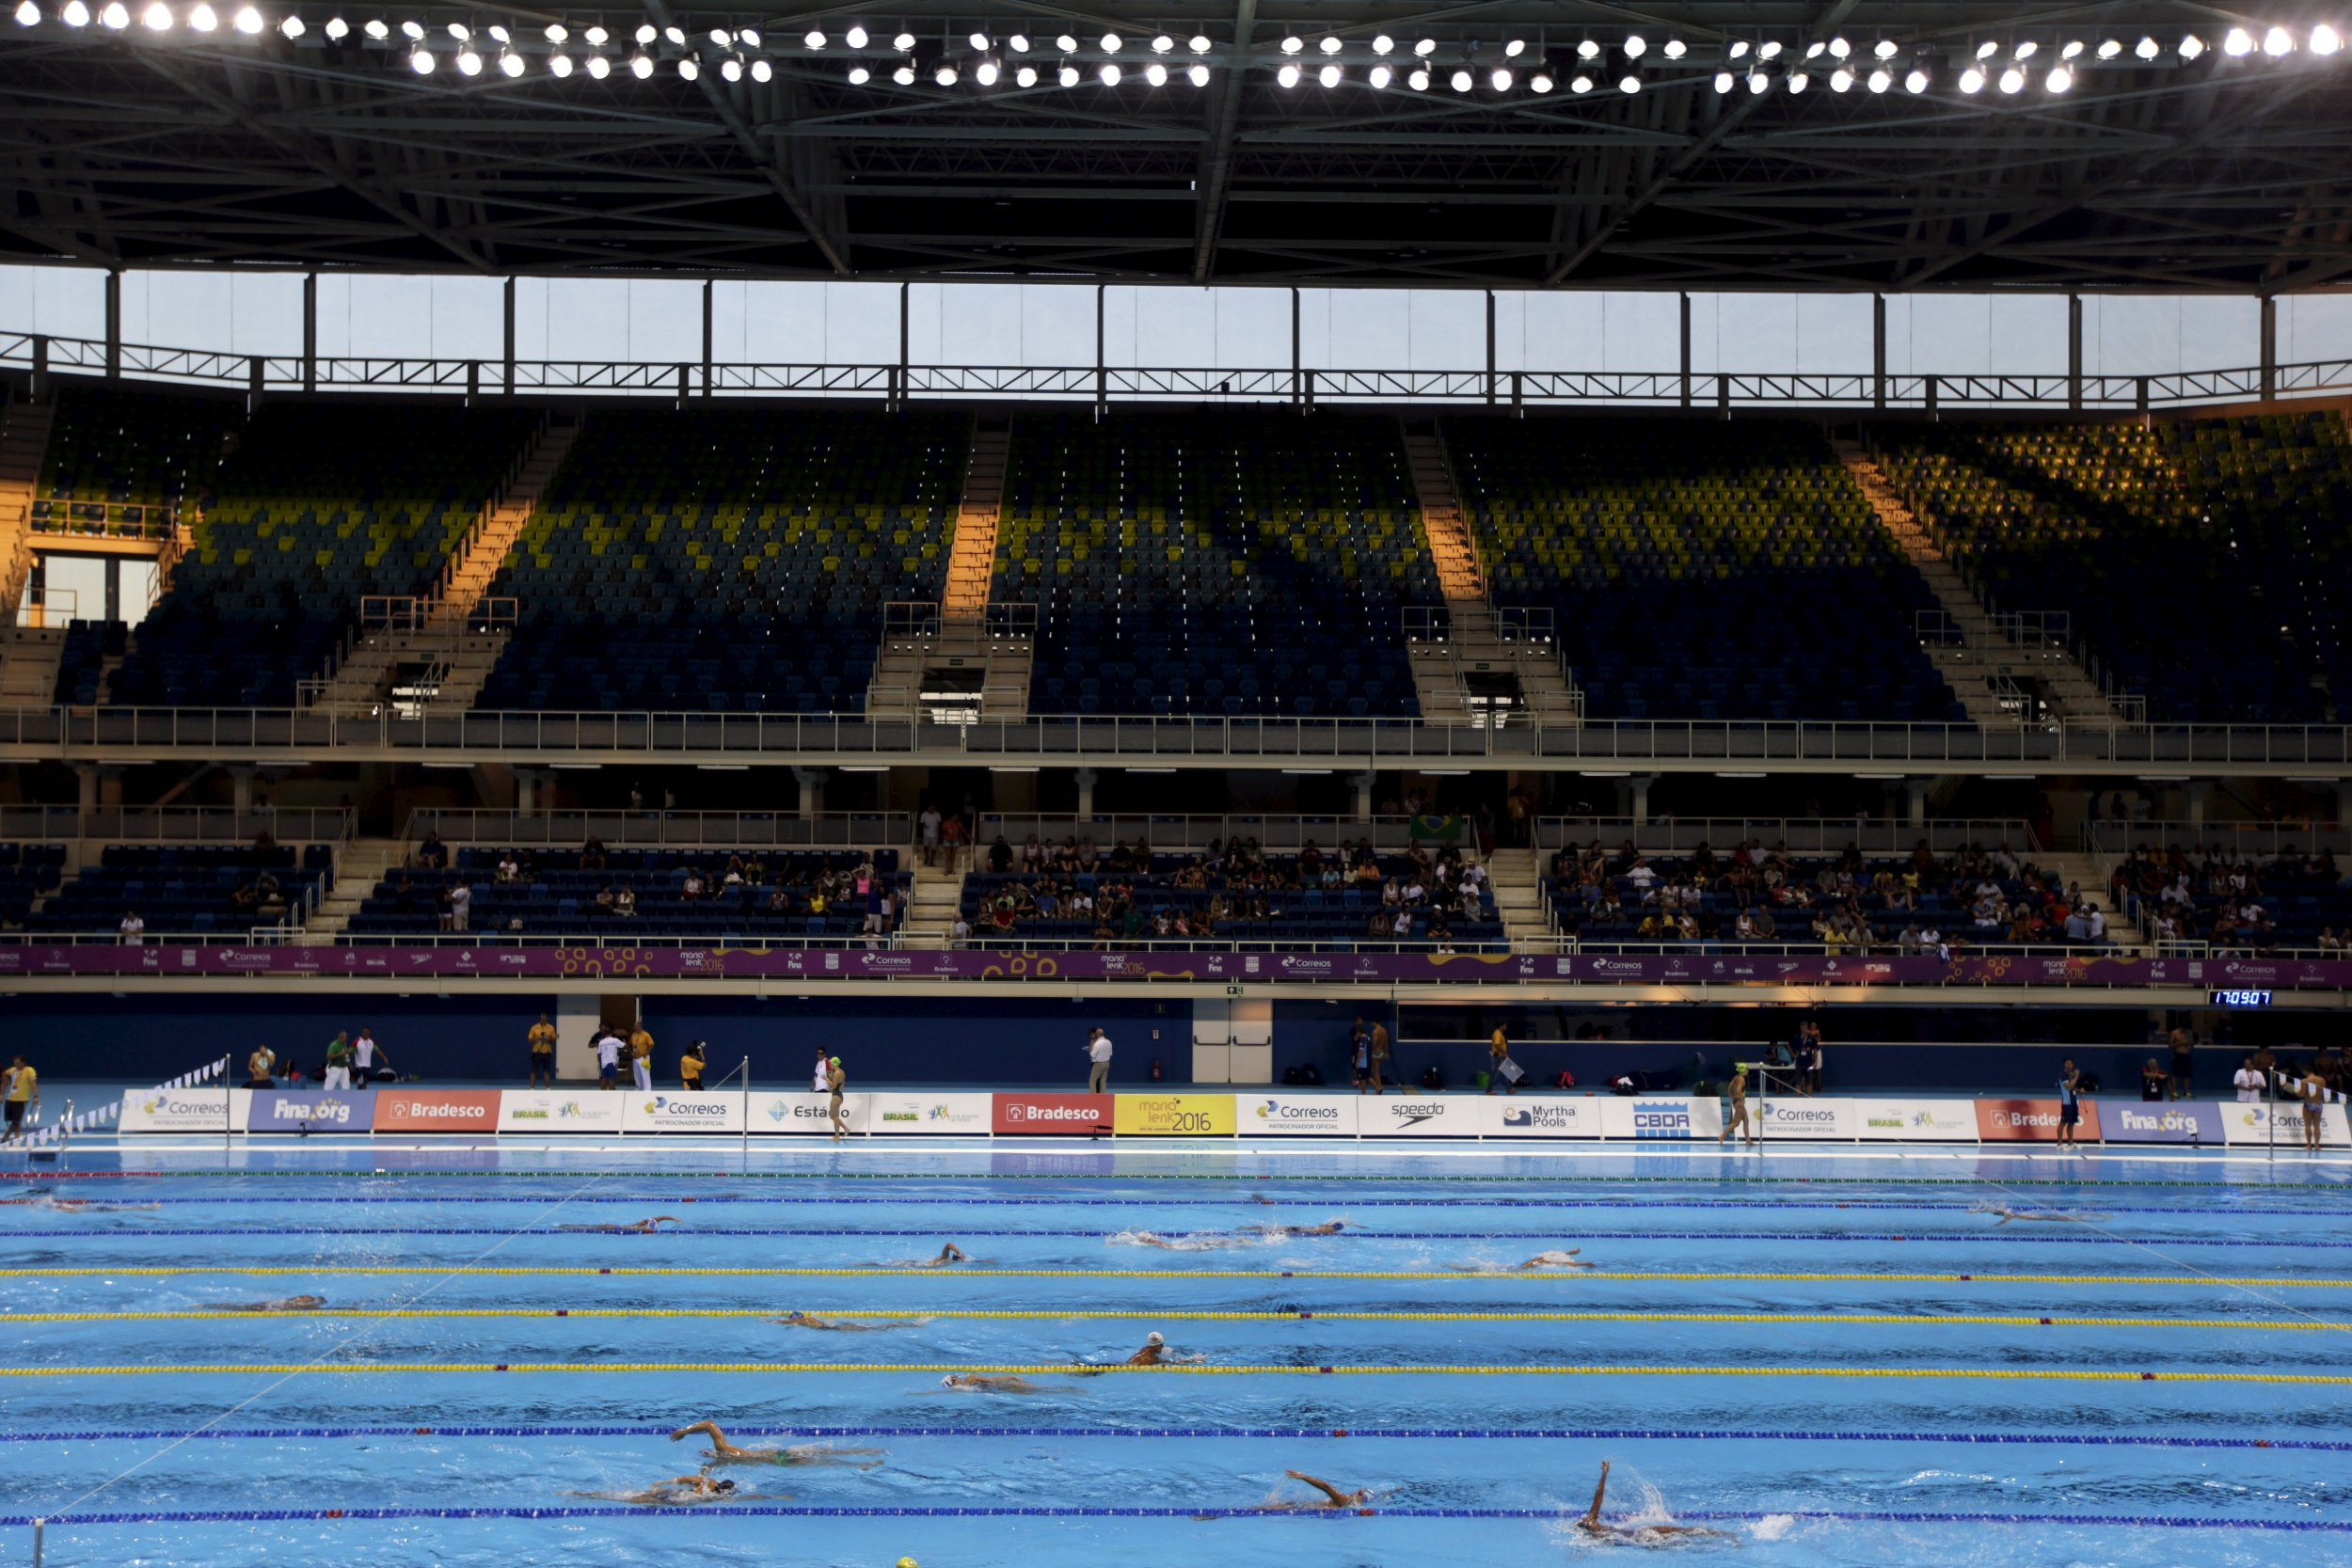 6-10-16 Olympic swimming